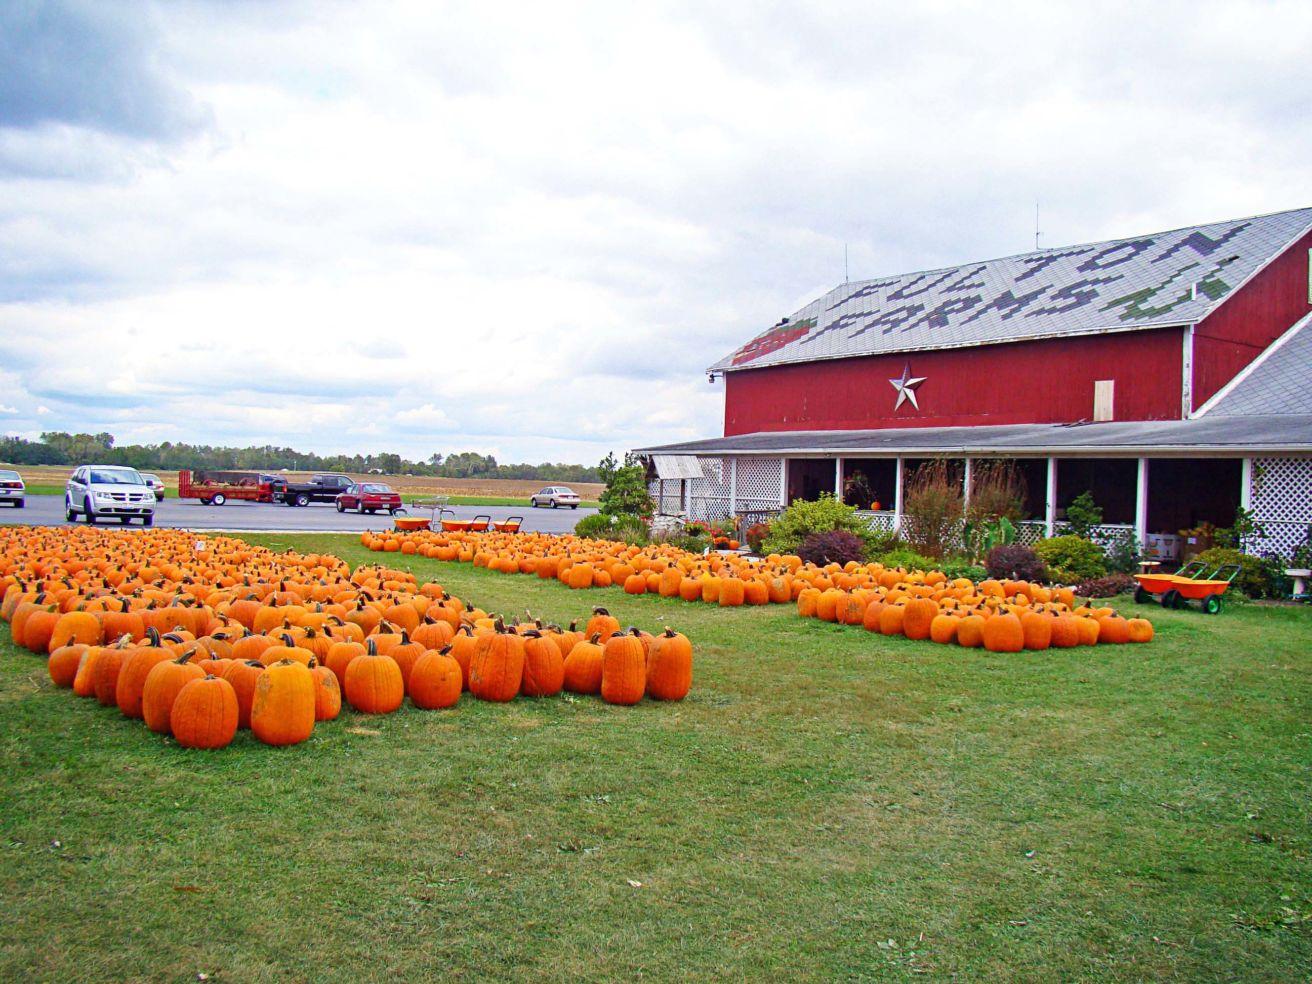 Pumpkins in Ohio